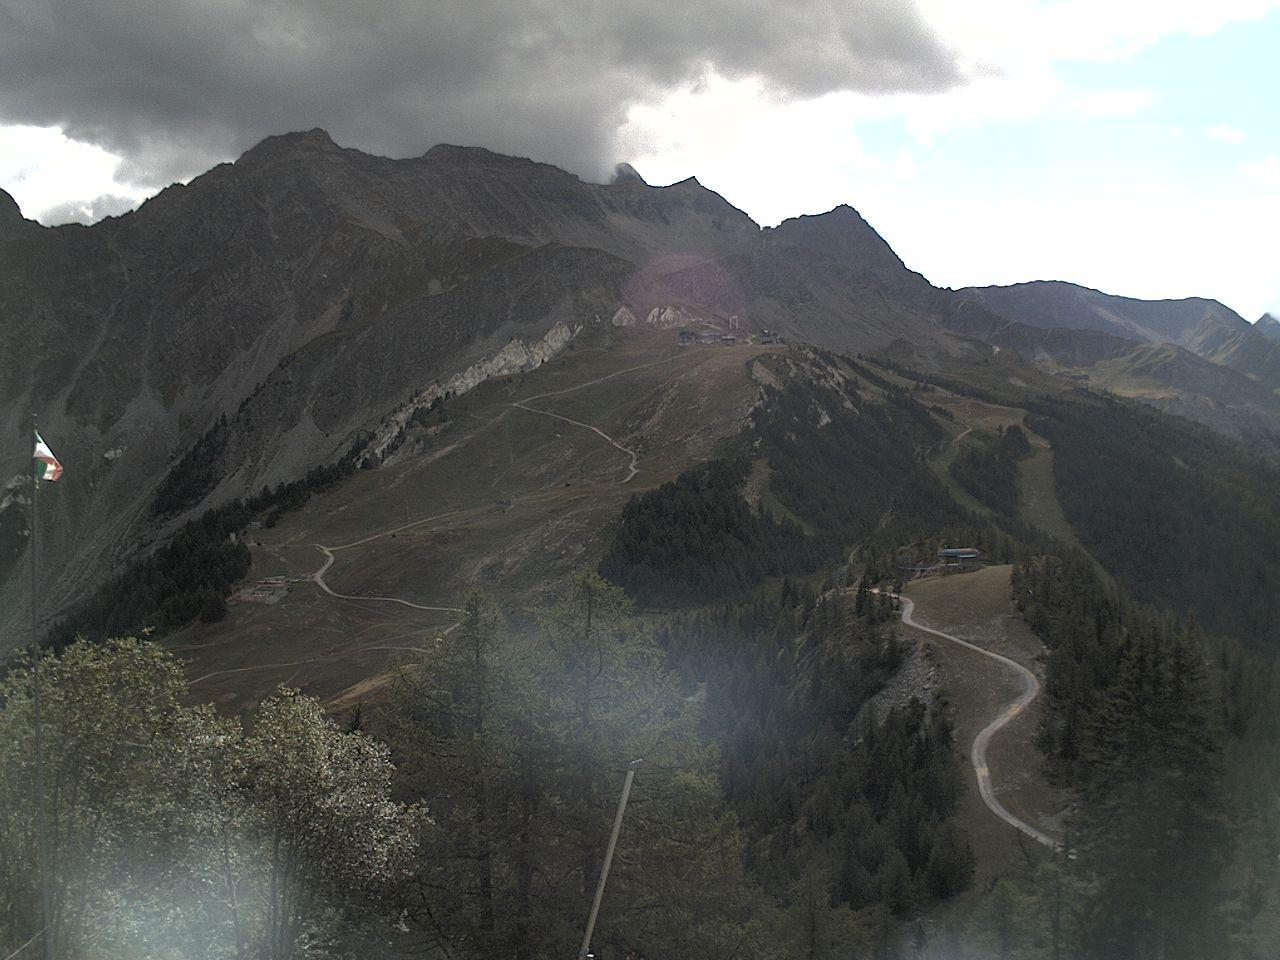 Webcam Feed from Courmayeur, Aosta Valley, Italy